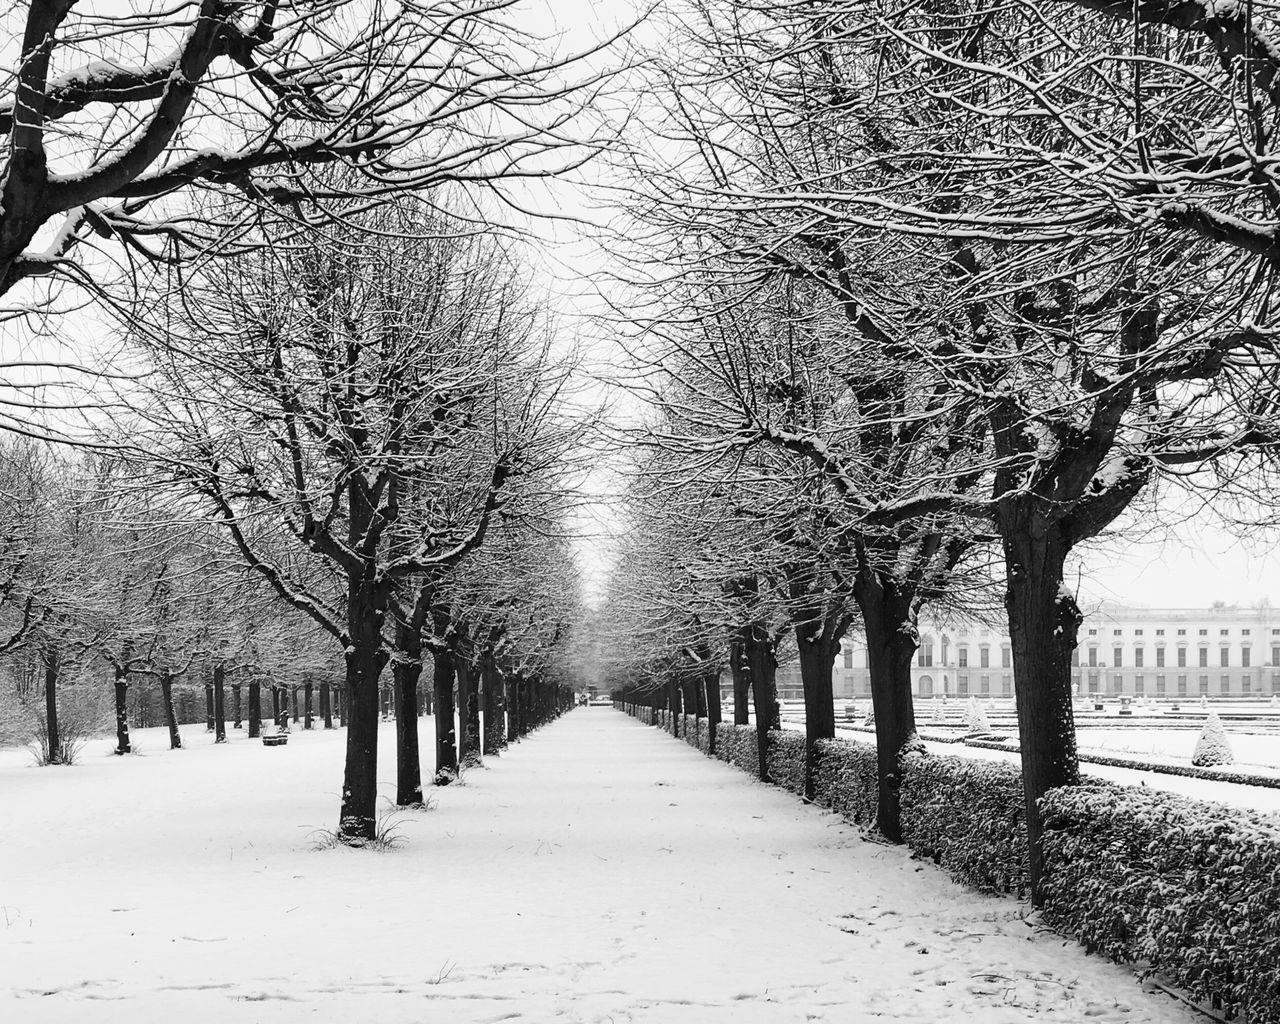 winter Winter Wonderland Wintertime Winter Trees Park Schloss Charlottenburg